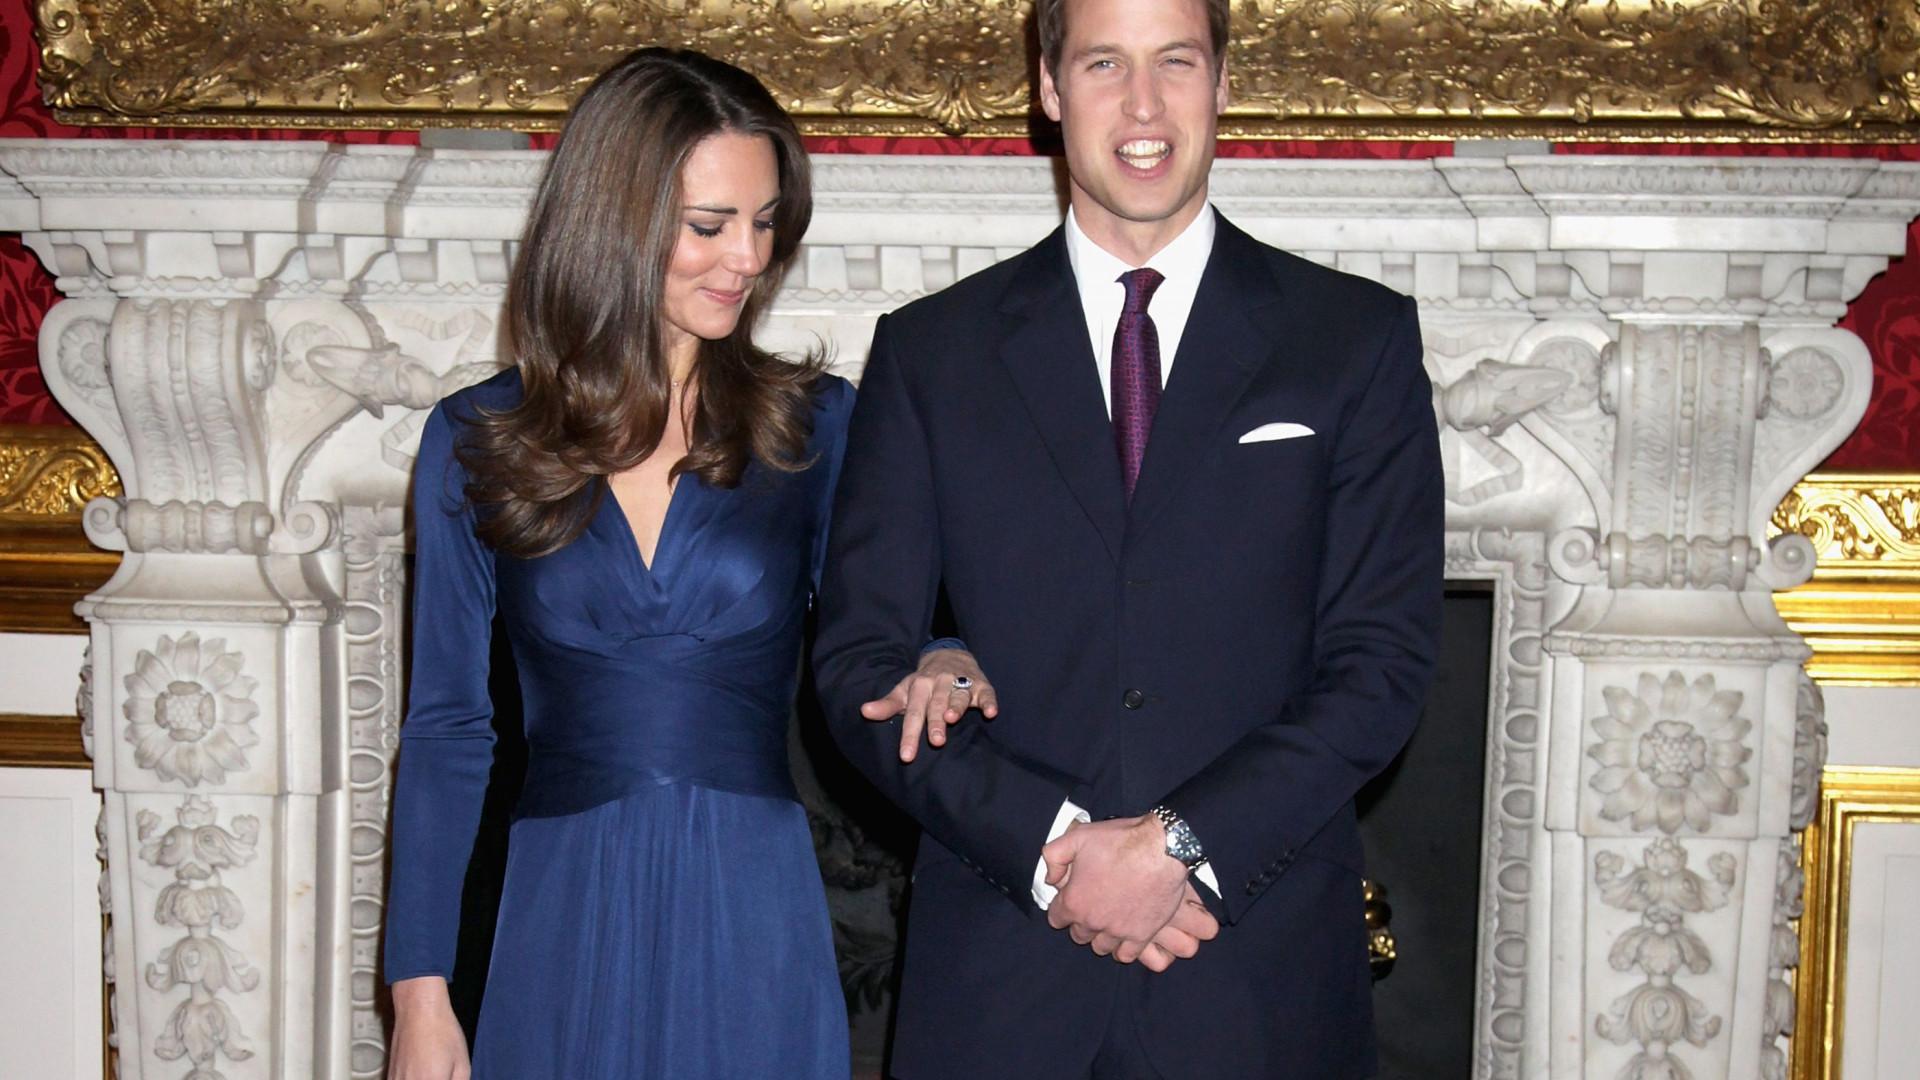 Anel de noivado de Kate Middleton gerou controvérsia na família real